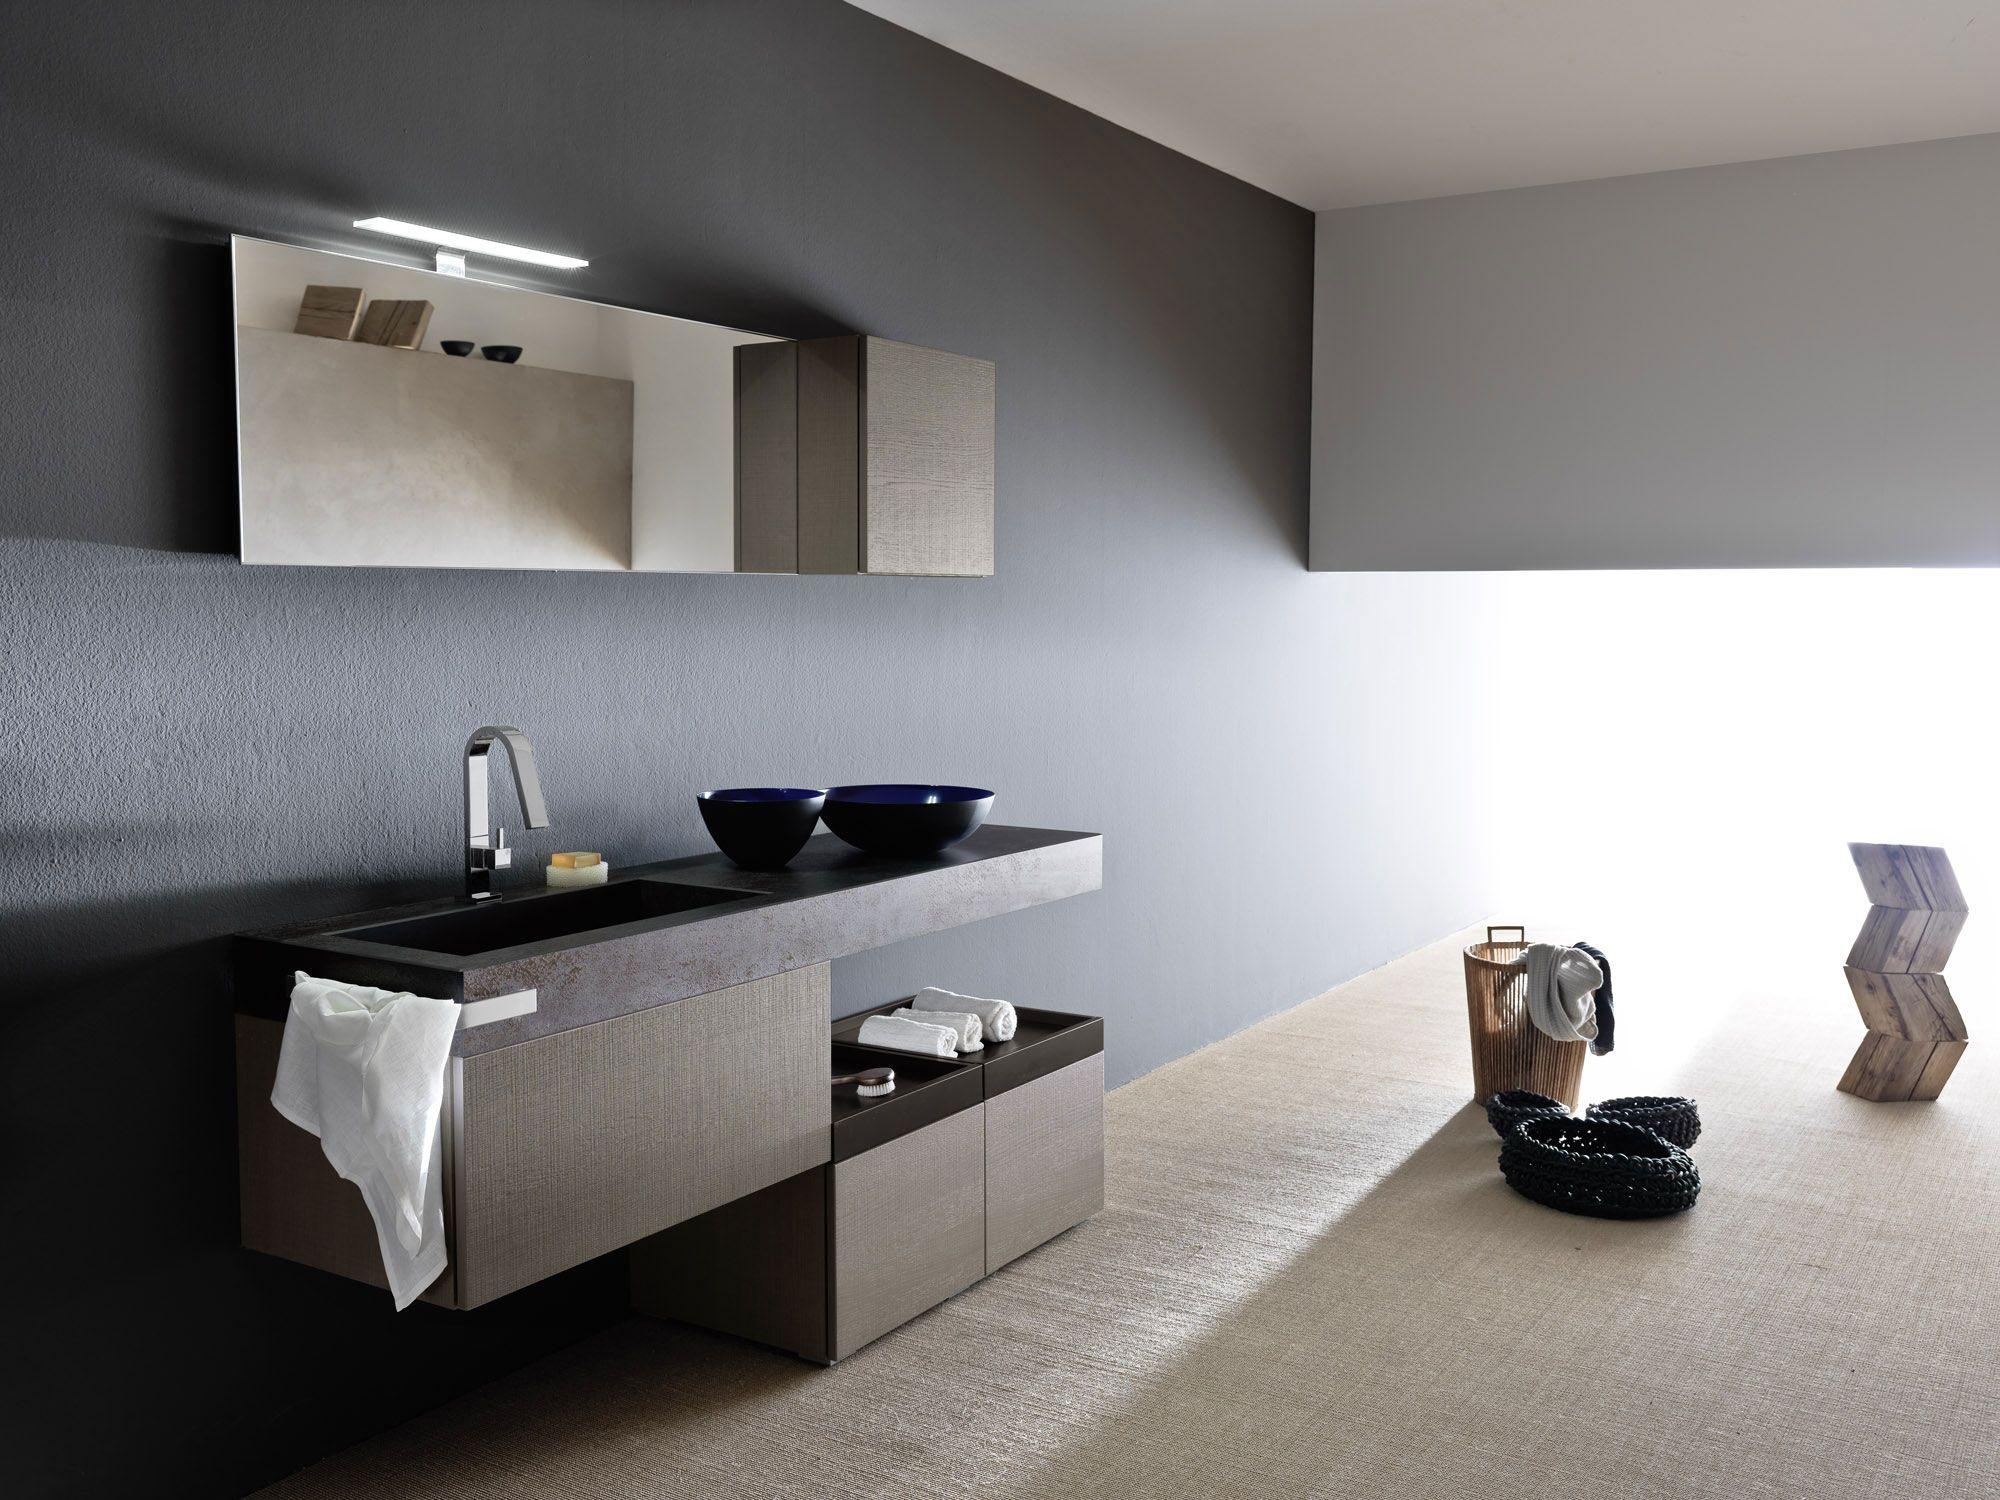 Arbi Arredobagno Sky Seghettato 45 | Salle de bains | Pinterest